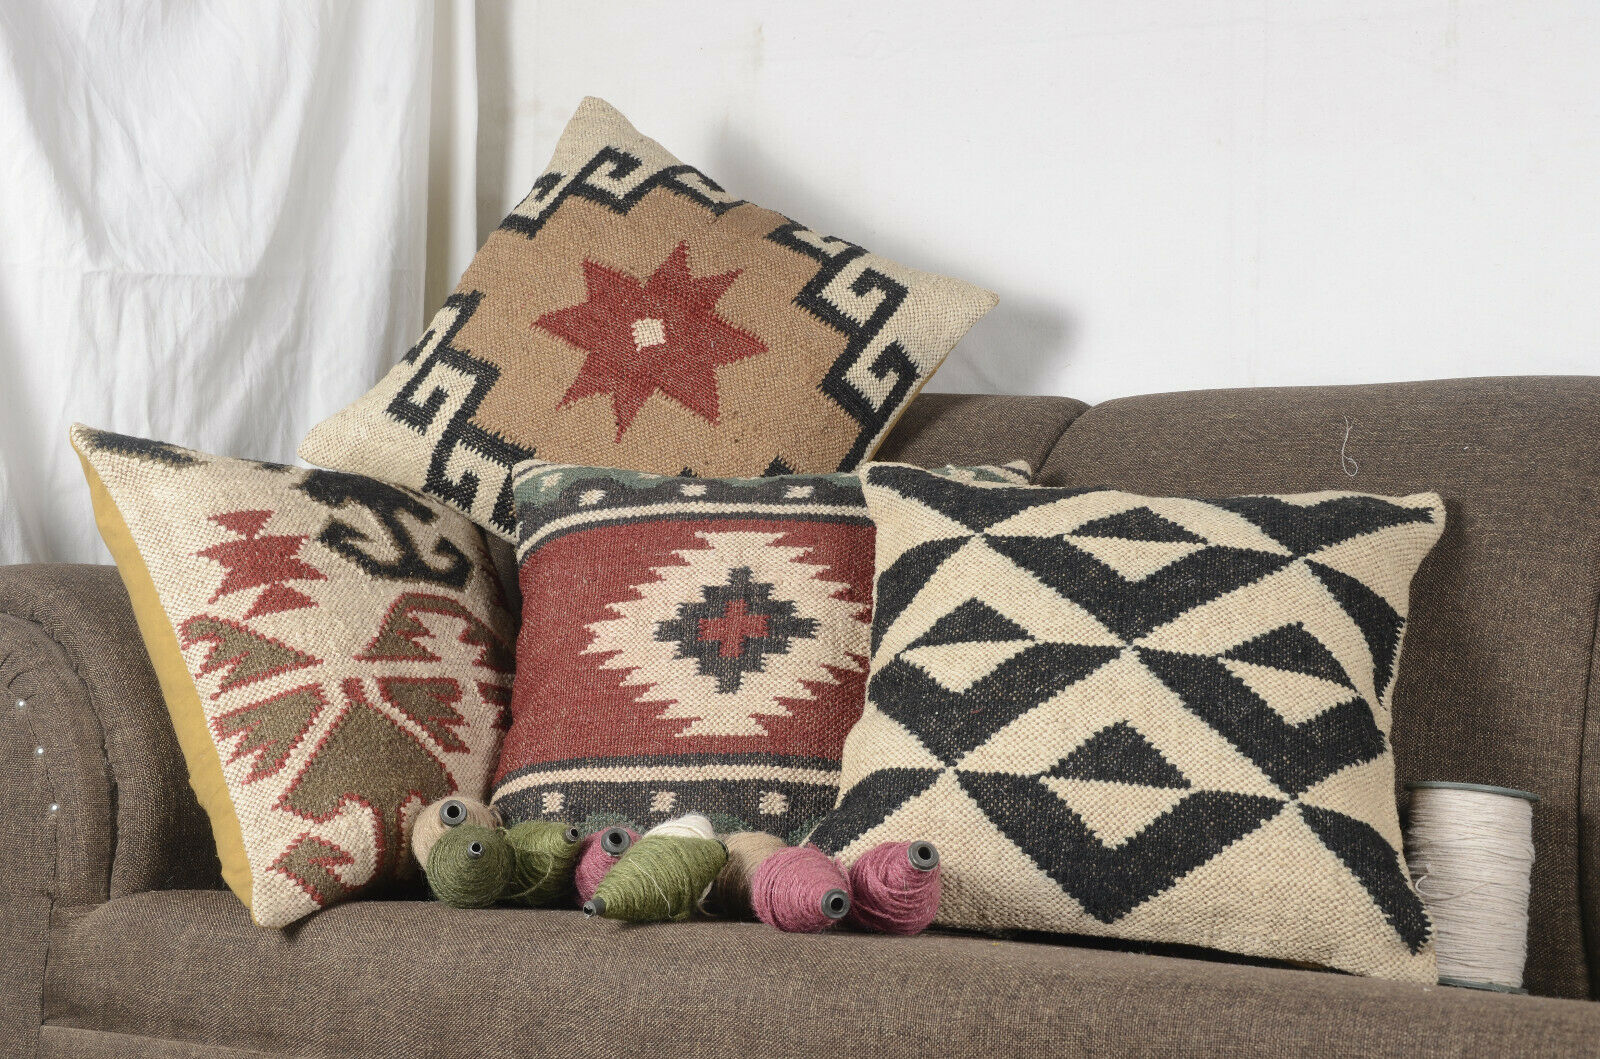 4 Pcs set of Jute Pillow Cover Throw Indian Jute Cushion Handmade Kilim Vintage